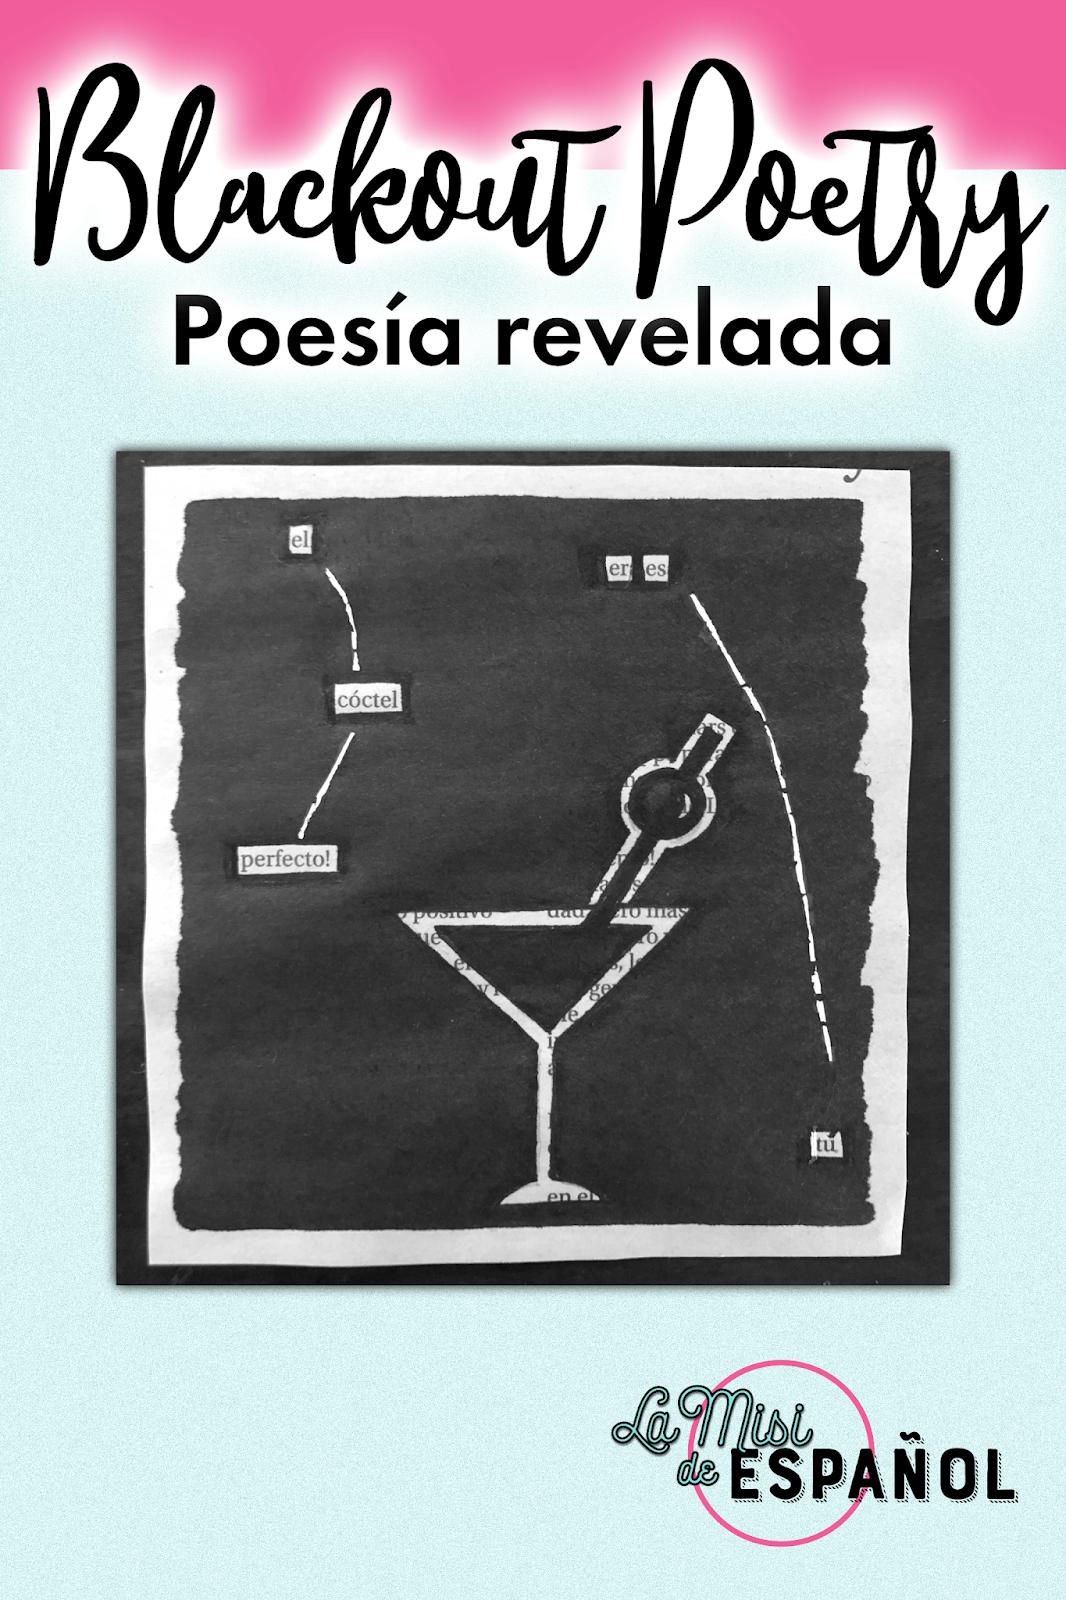 Aprende los pasos para crear un poema blackout para ti o para enseñar a tus alumnos con este tutorial.